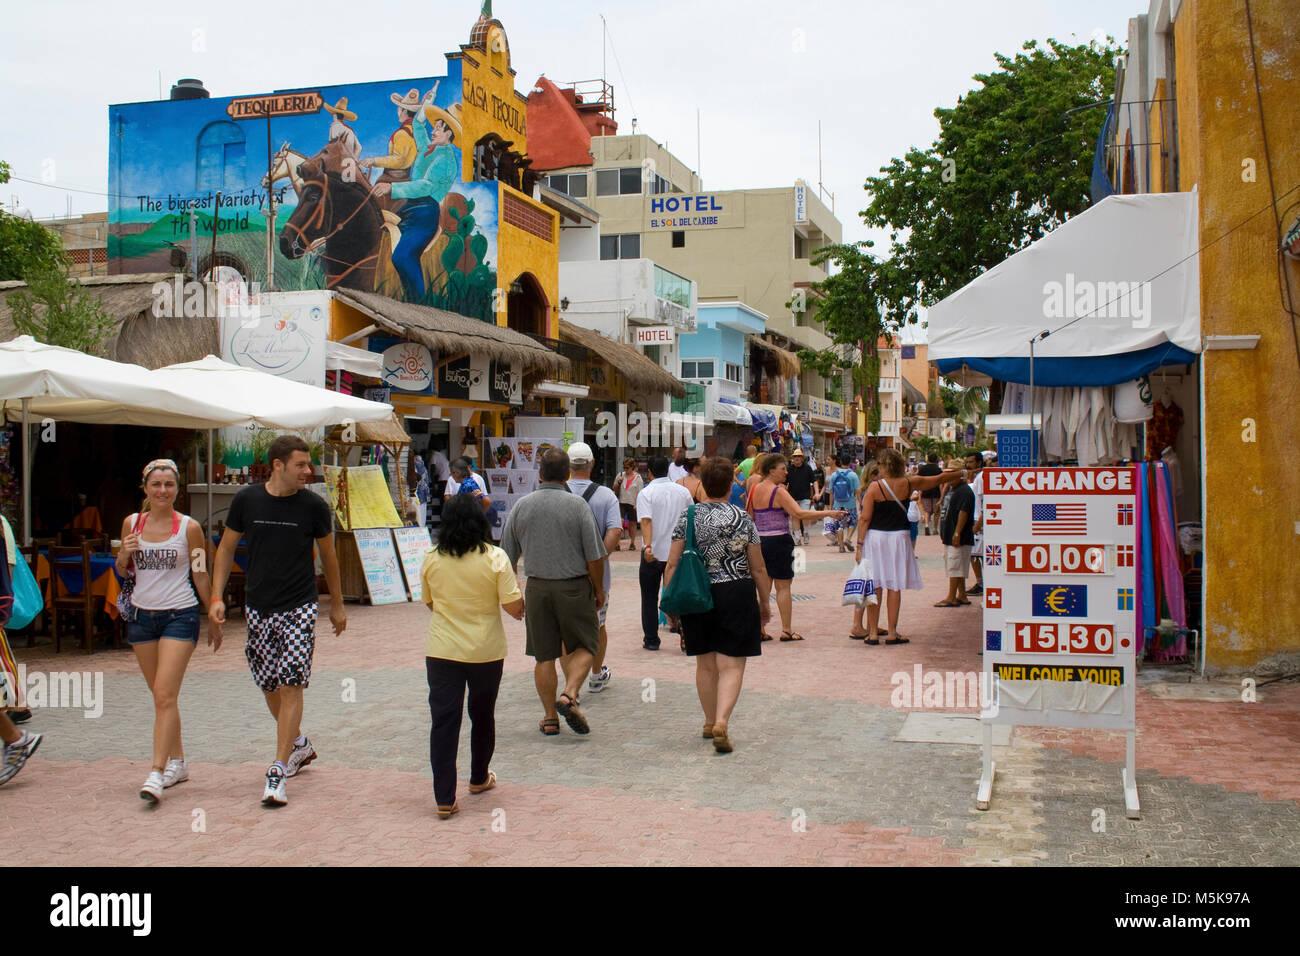 Touristen auf der Flaniermeile, Playa del Carmen, Mexiko, Karibik   Tourists at strolling promenade at Playa del - Stock Image